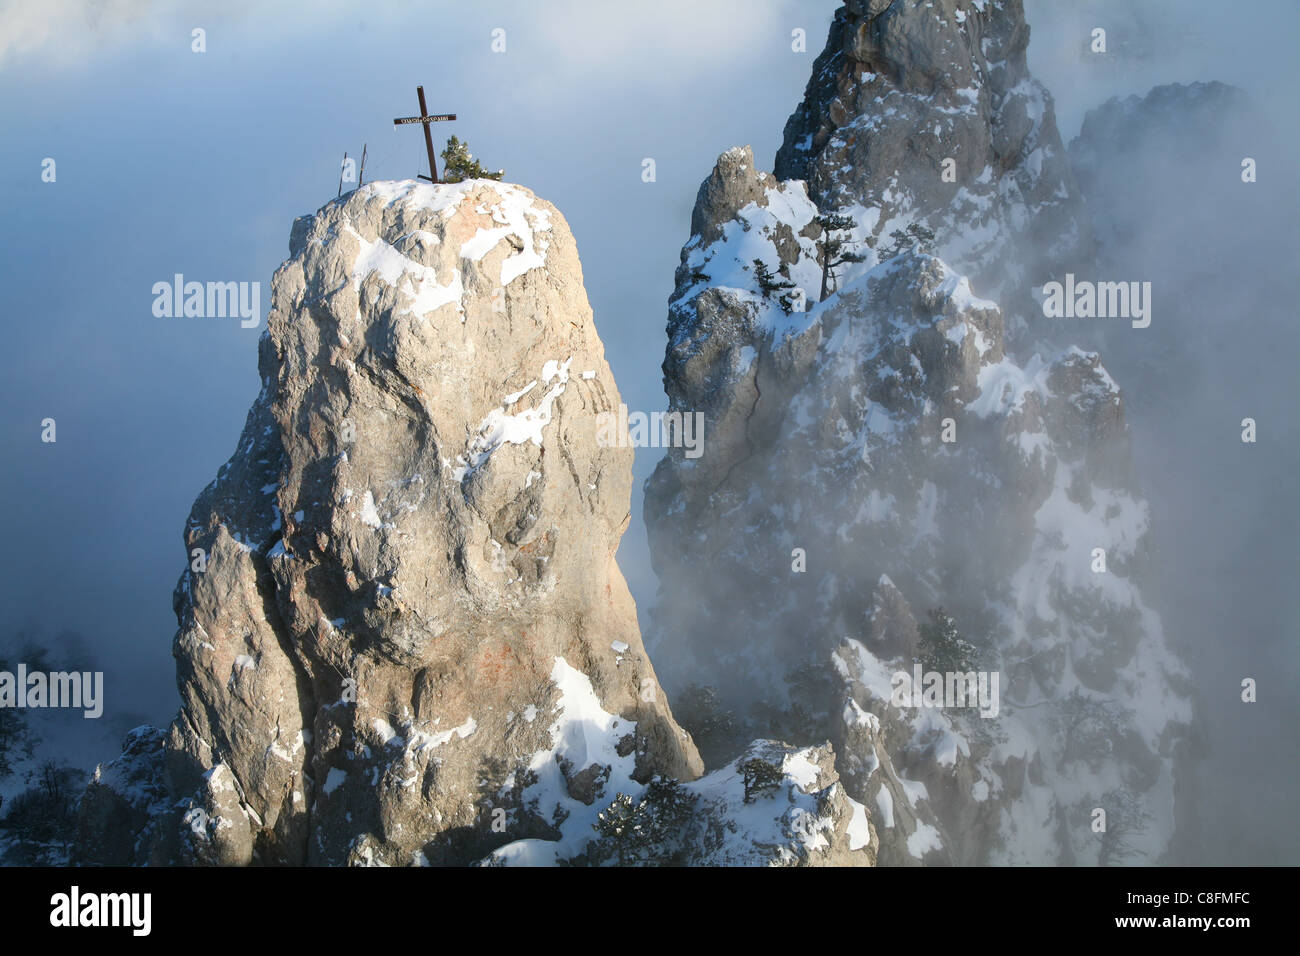 Snow-capped peaks of Mount Ai-Petri - Stock Image